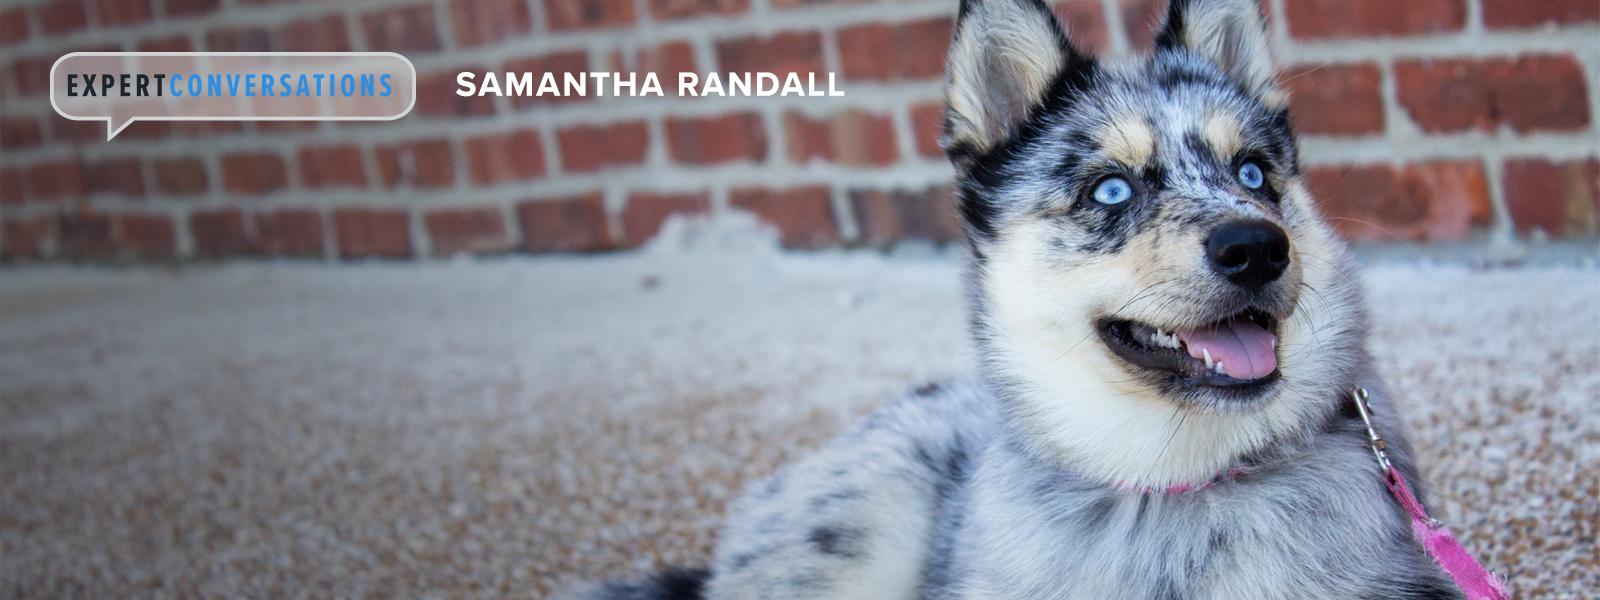 Expert Conversations with Samantha Randall